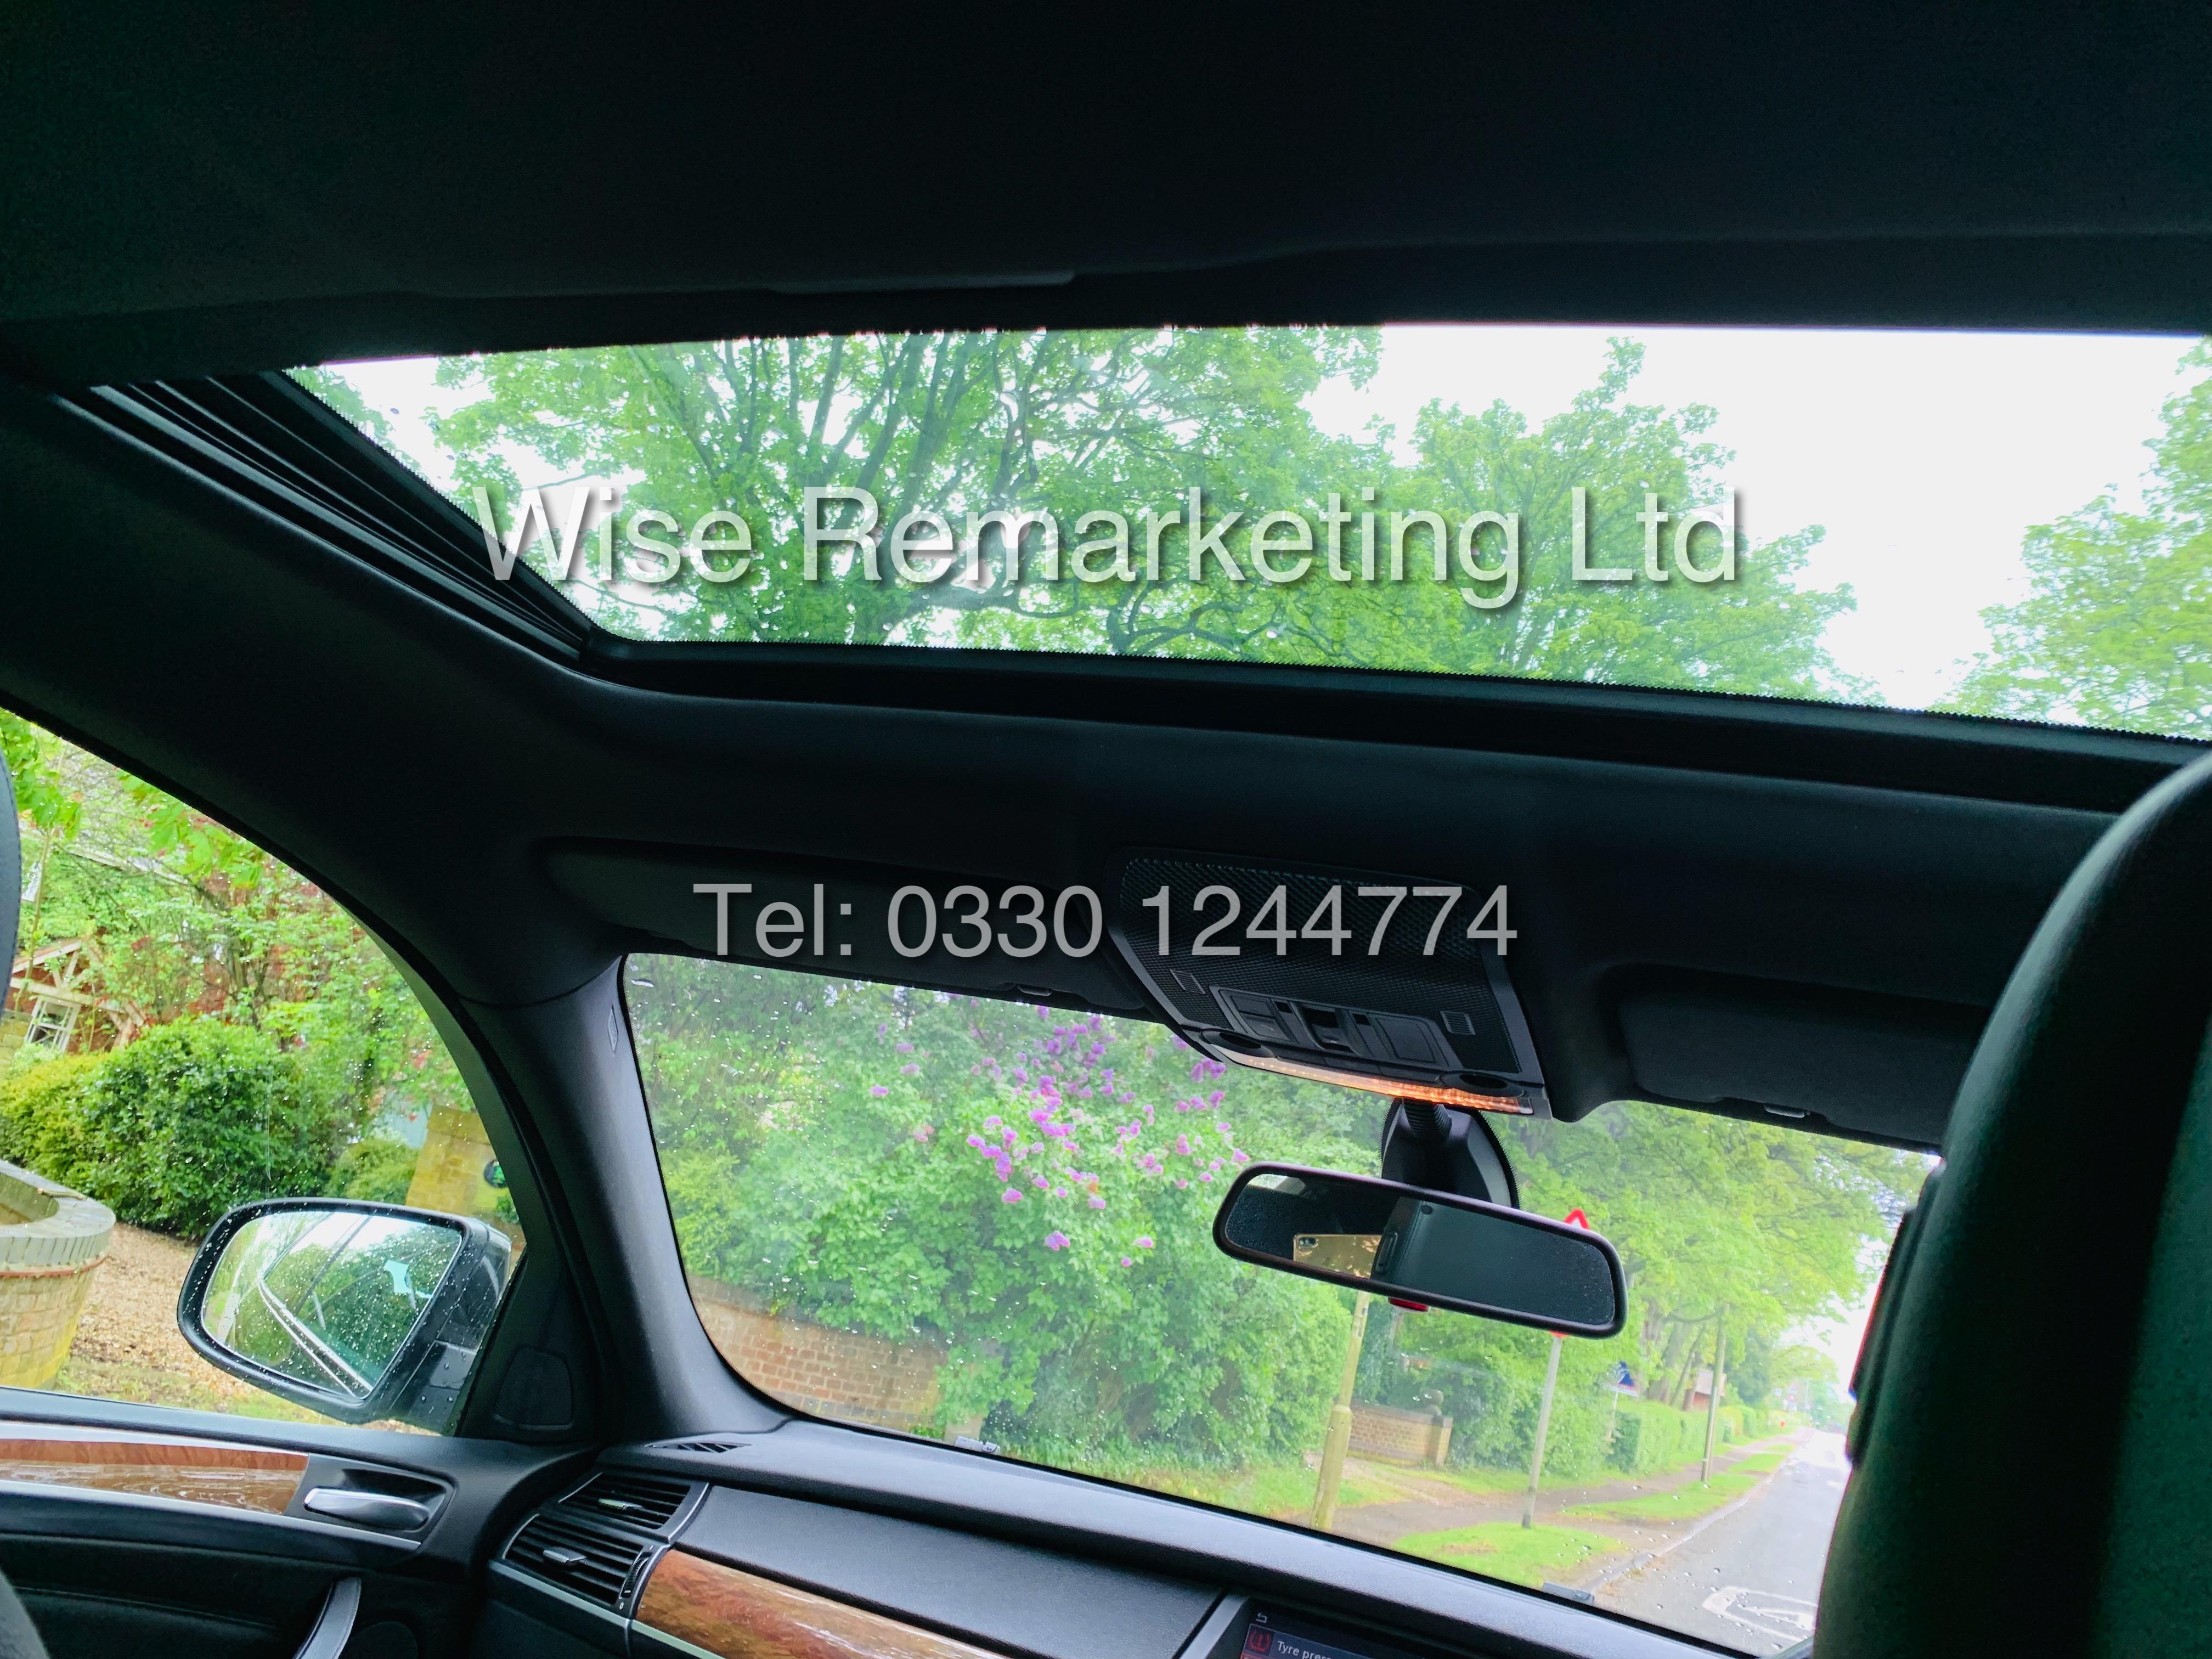 BMW X6 XDRIVE 35D AUTO (2009 SPEC) *1 PREVIOUS OWNER* PARKING AID - SAT NAV - FSH - Image 20 of 25